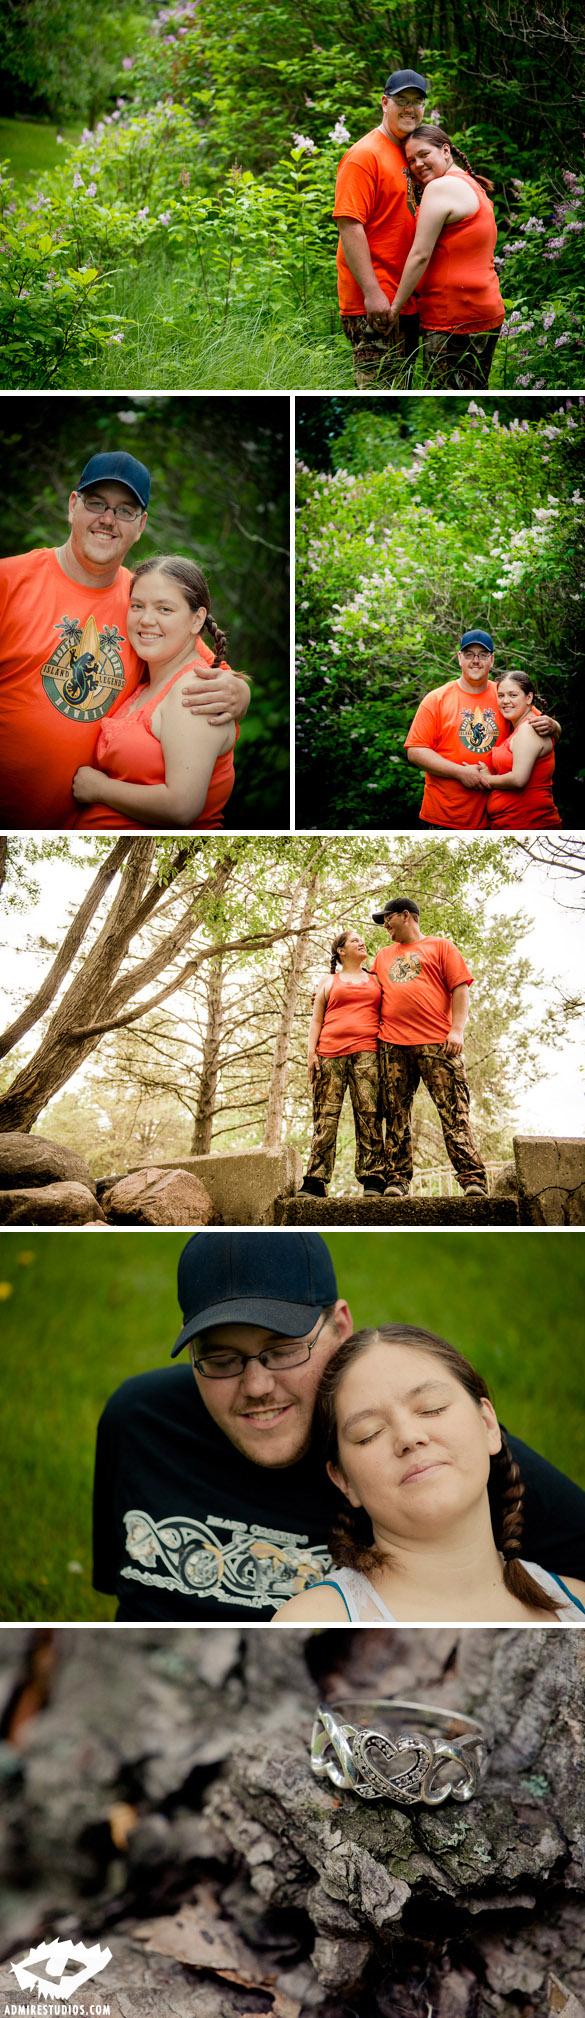 Edmonton Professional Photography